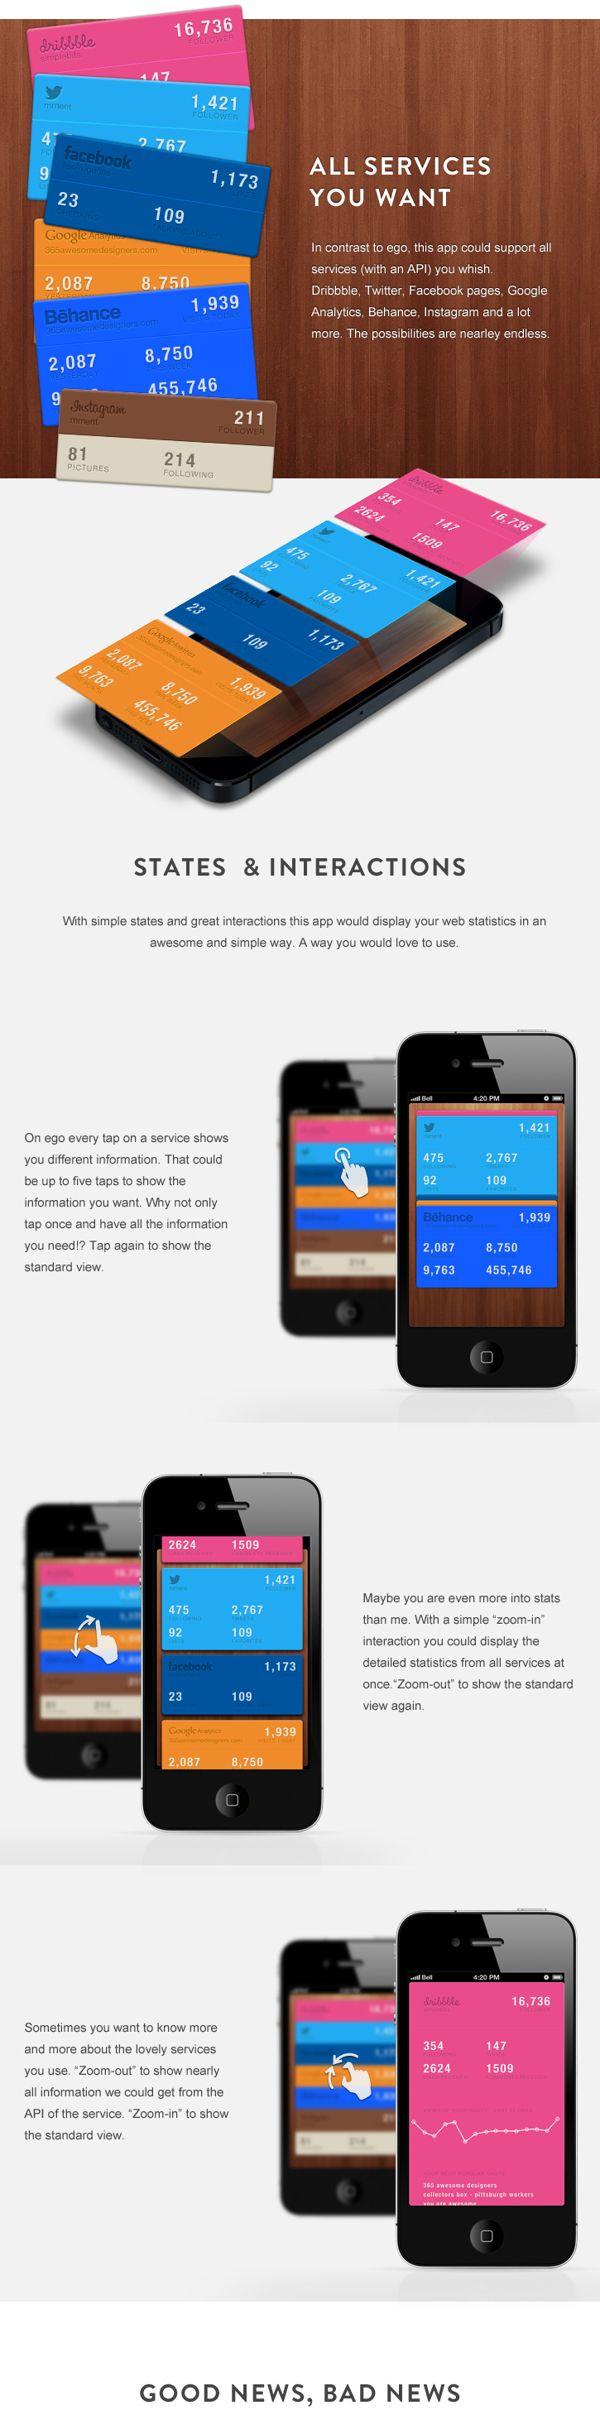 web stats app by Matthias Mentasti, via Behance